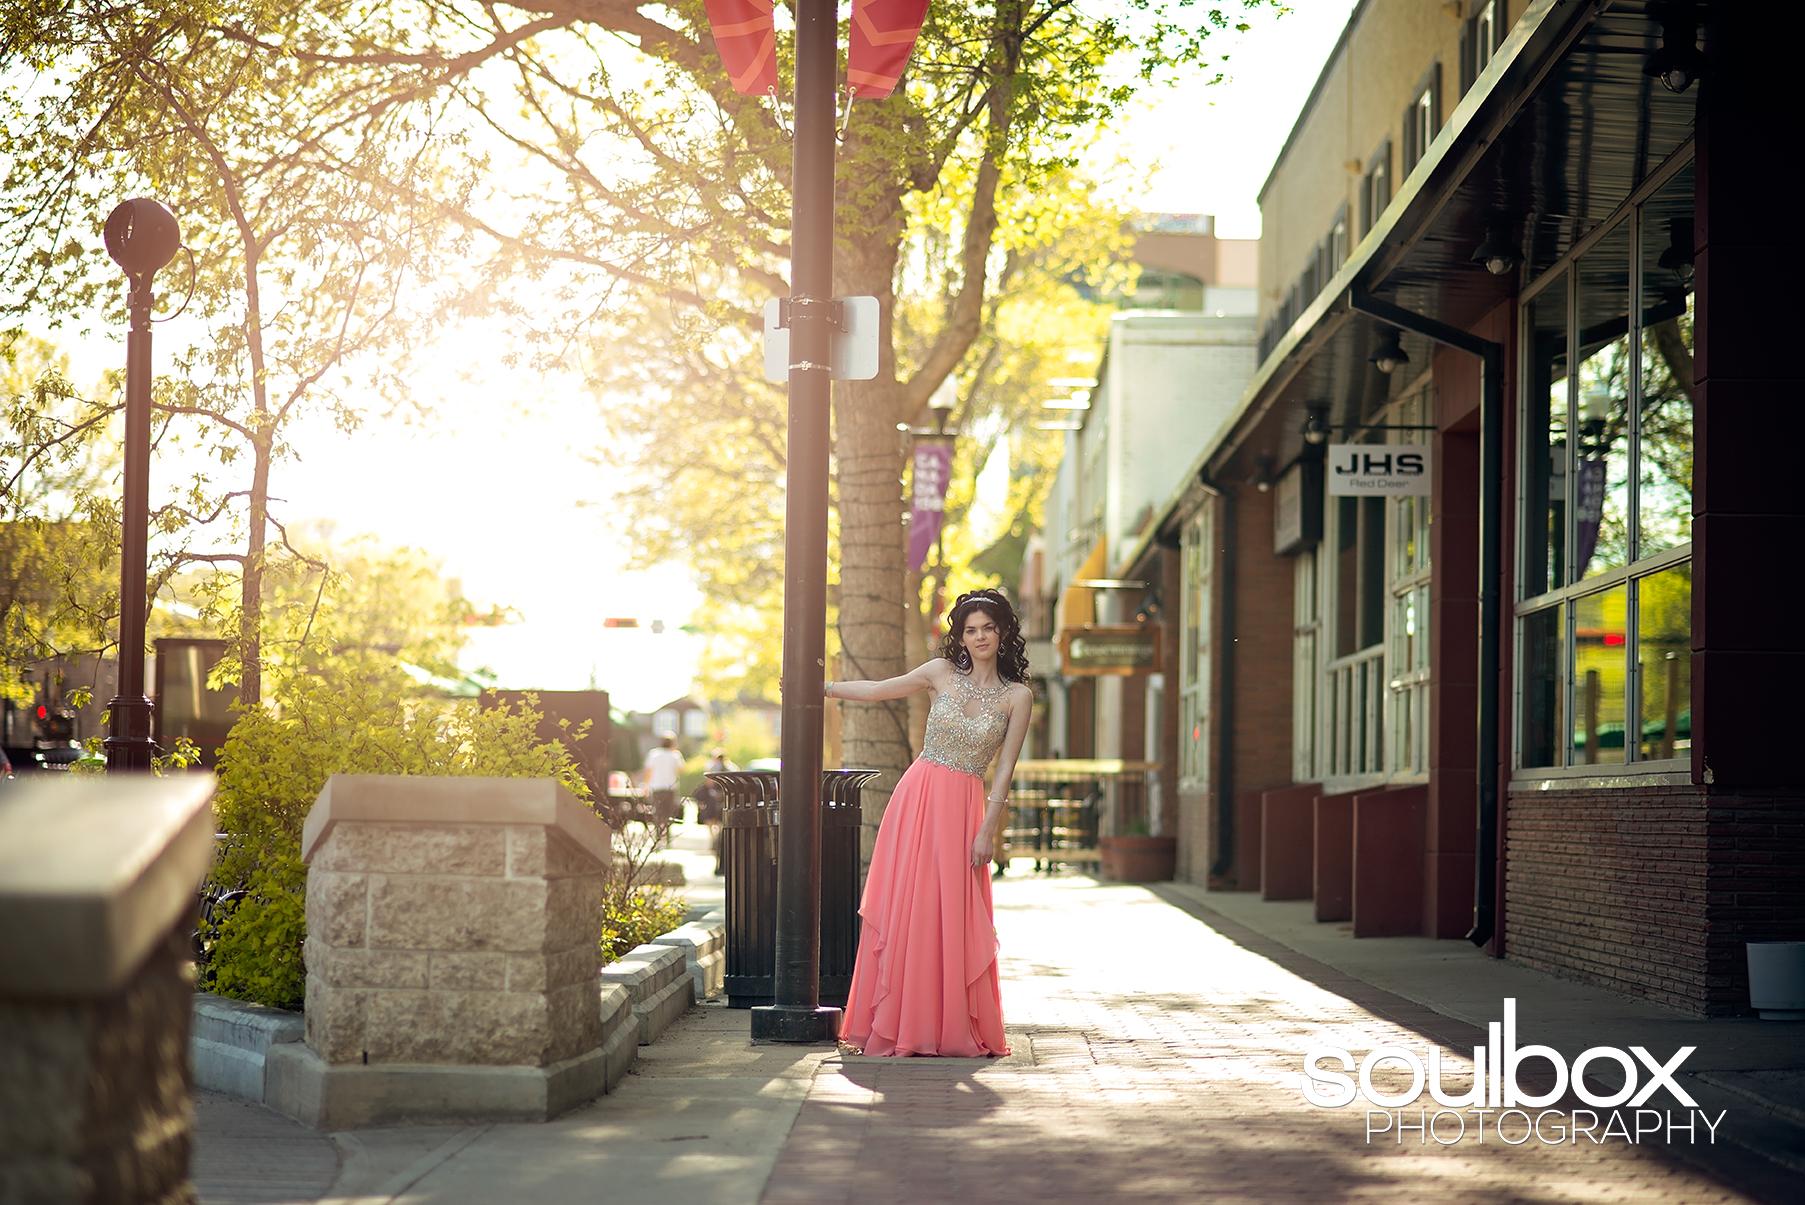 Soulbox Photography Graduation Photography